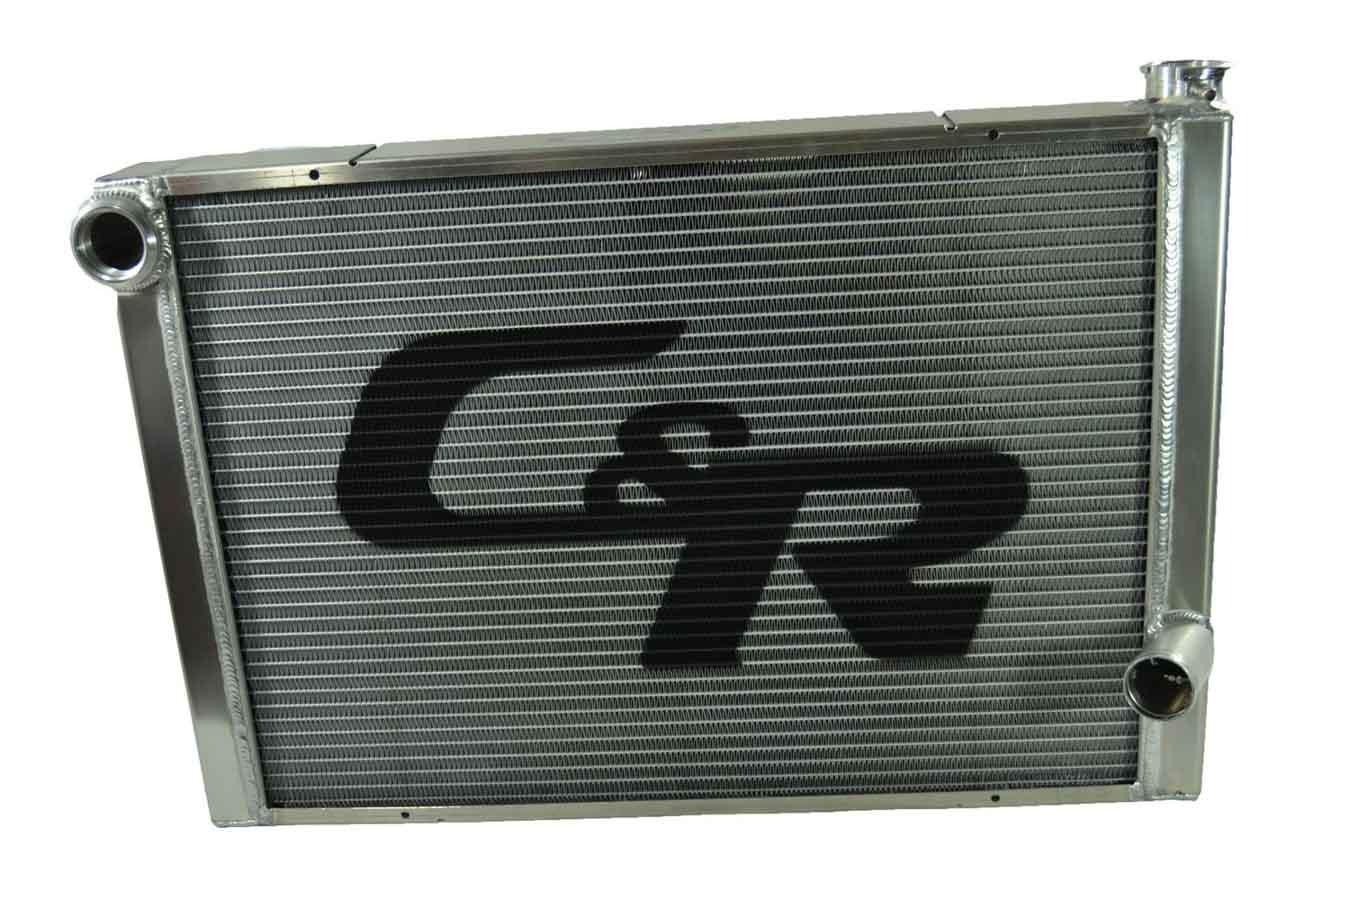 C AND R 31 in W x 18-9 16 in H x 3 in D Crossflow Radiator P N 800-31190 by C AND R Racing RADIATORS